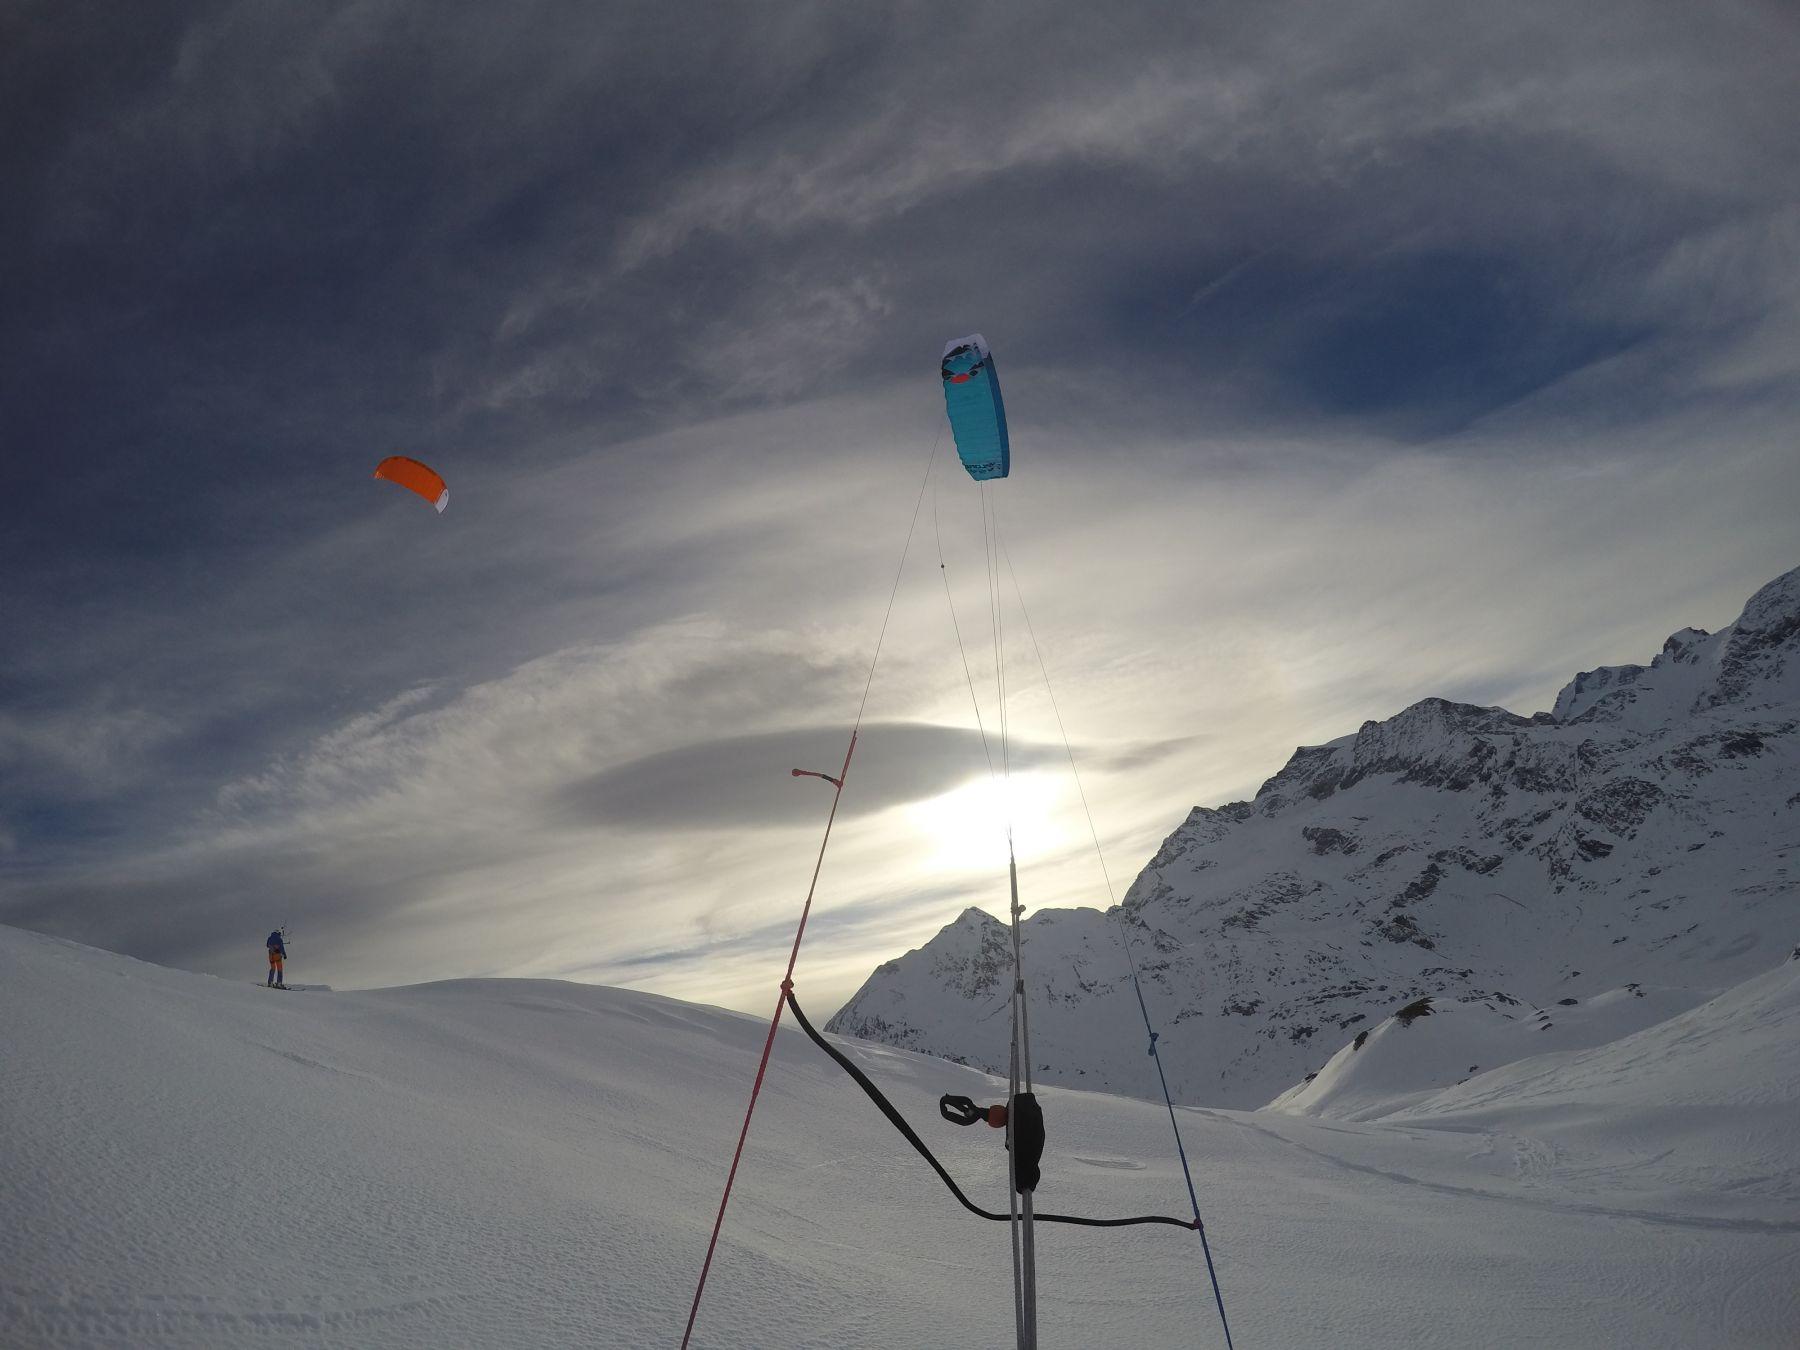 Ozonekites_ExploreV1_snowkite_odenwald_Passo_Bernina_backcountry_3